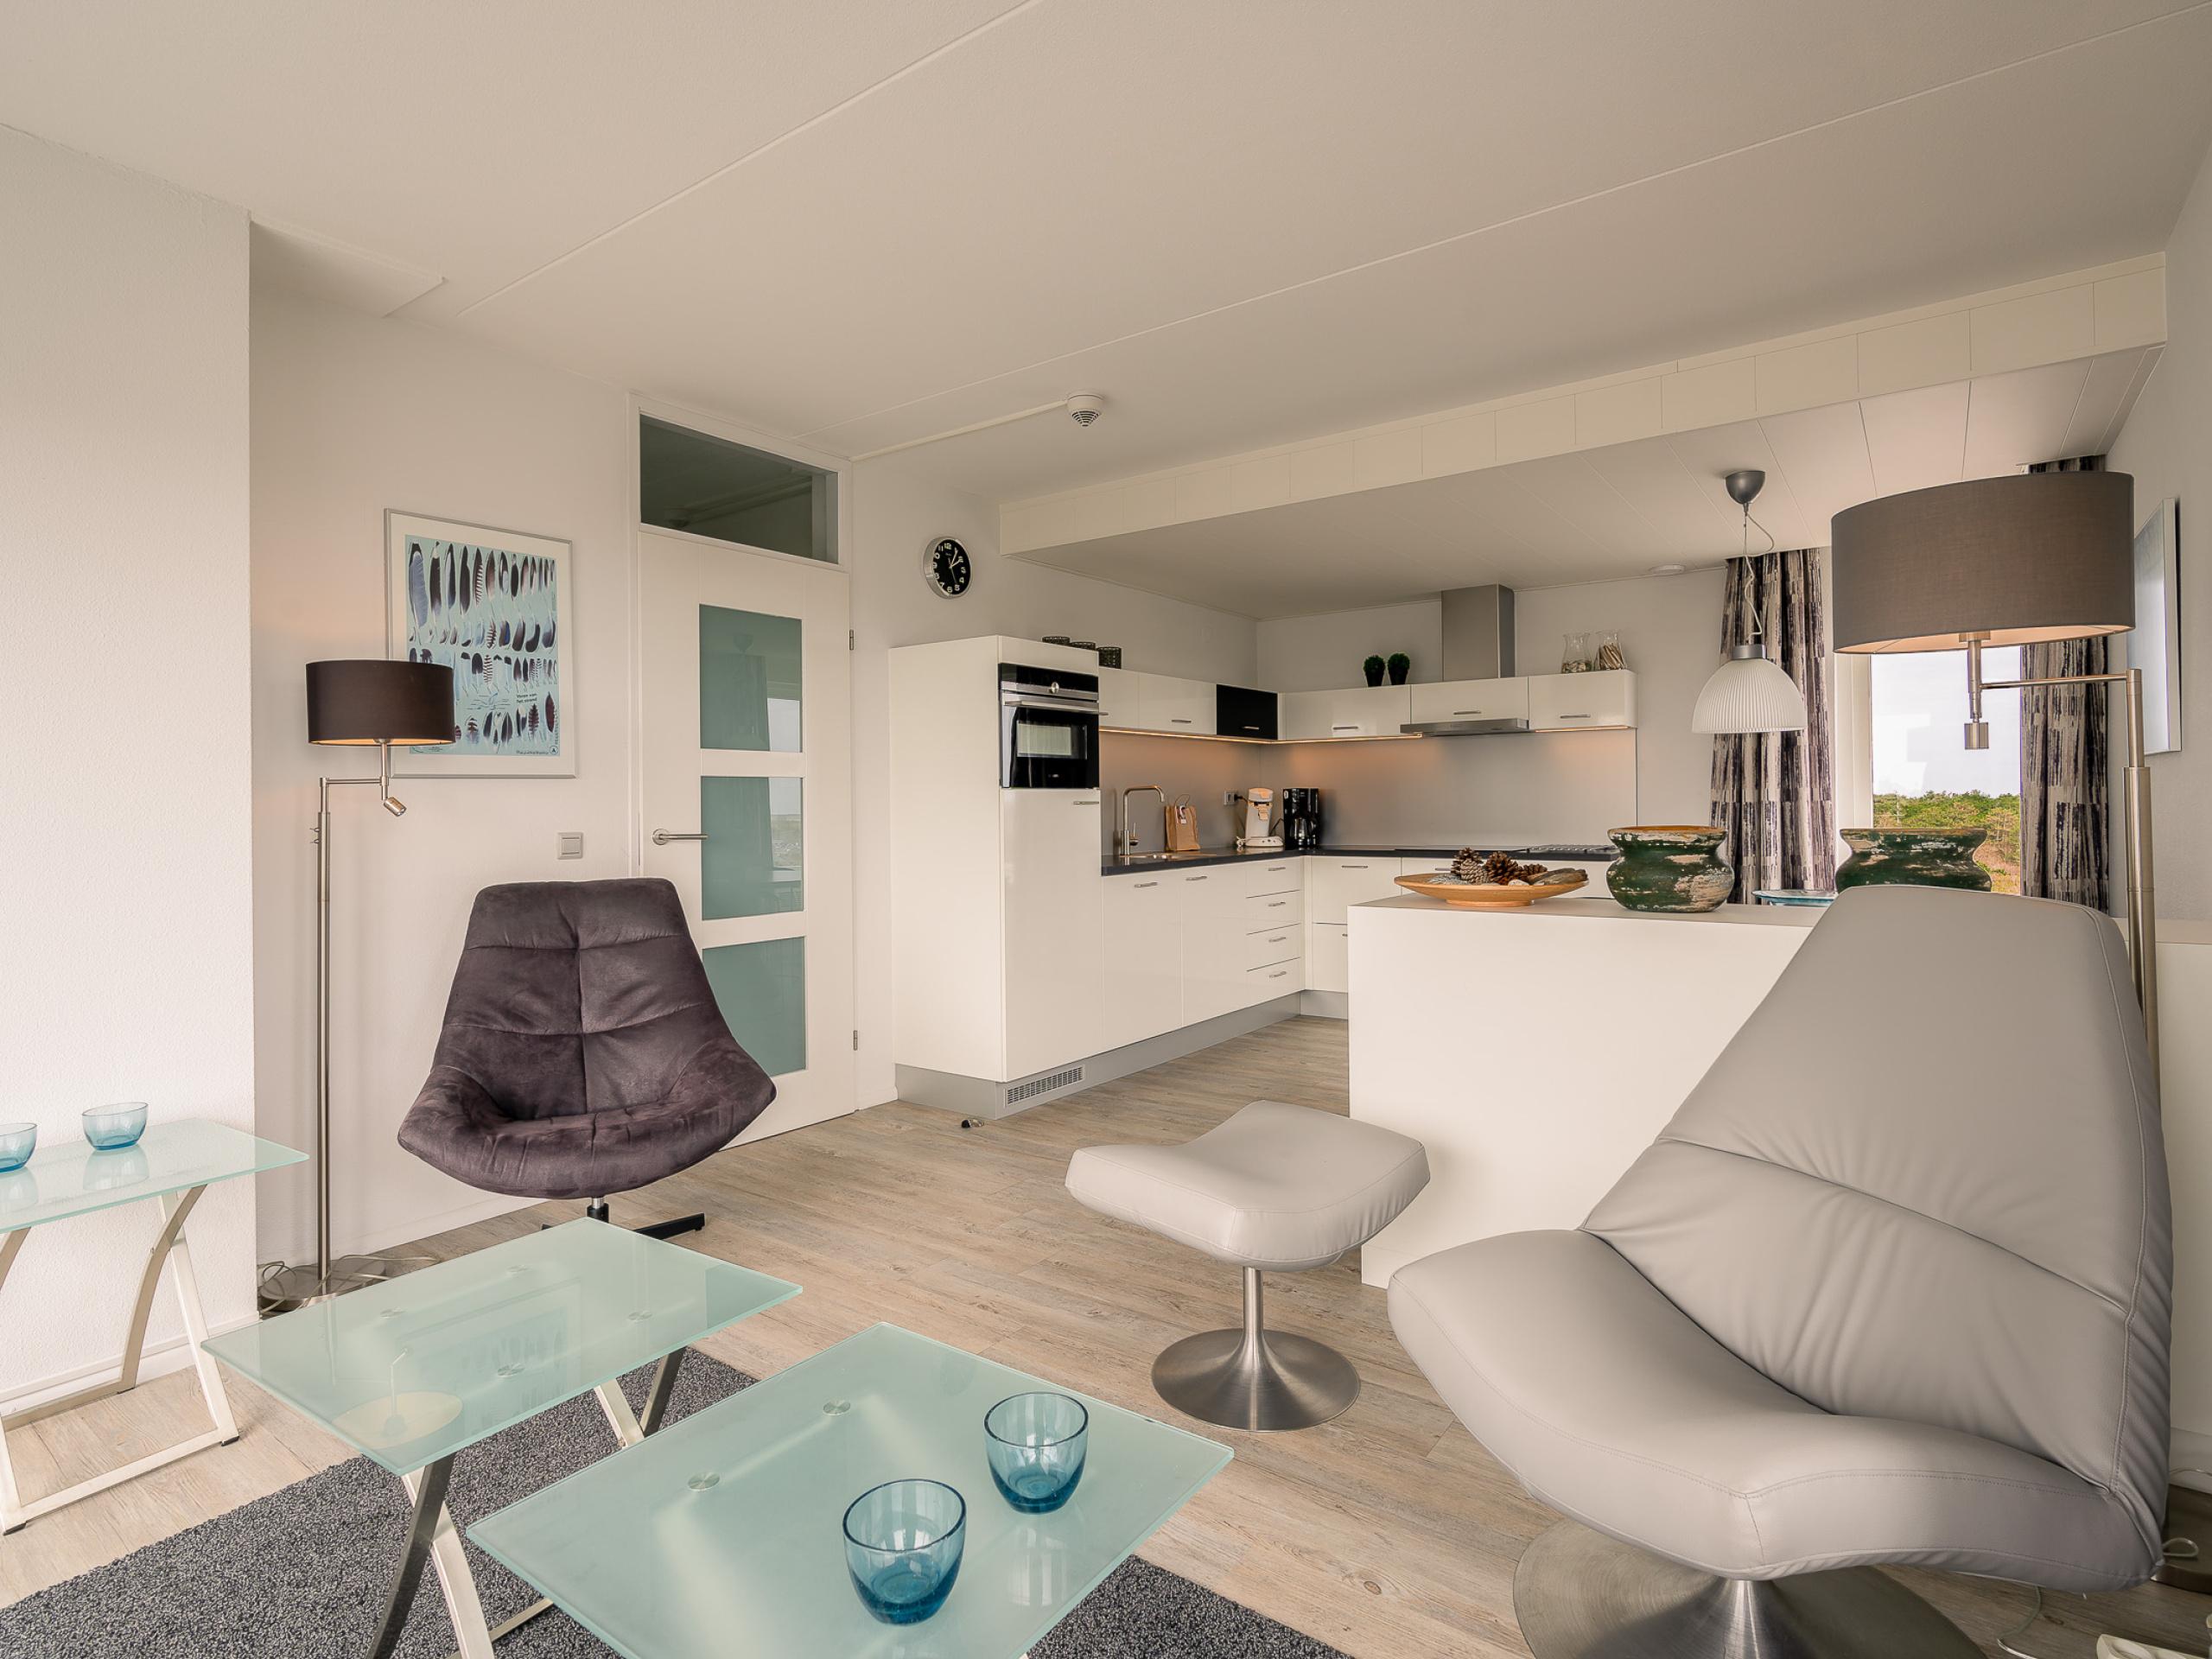 Modern apartment with balcony and views of De Koog